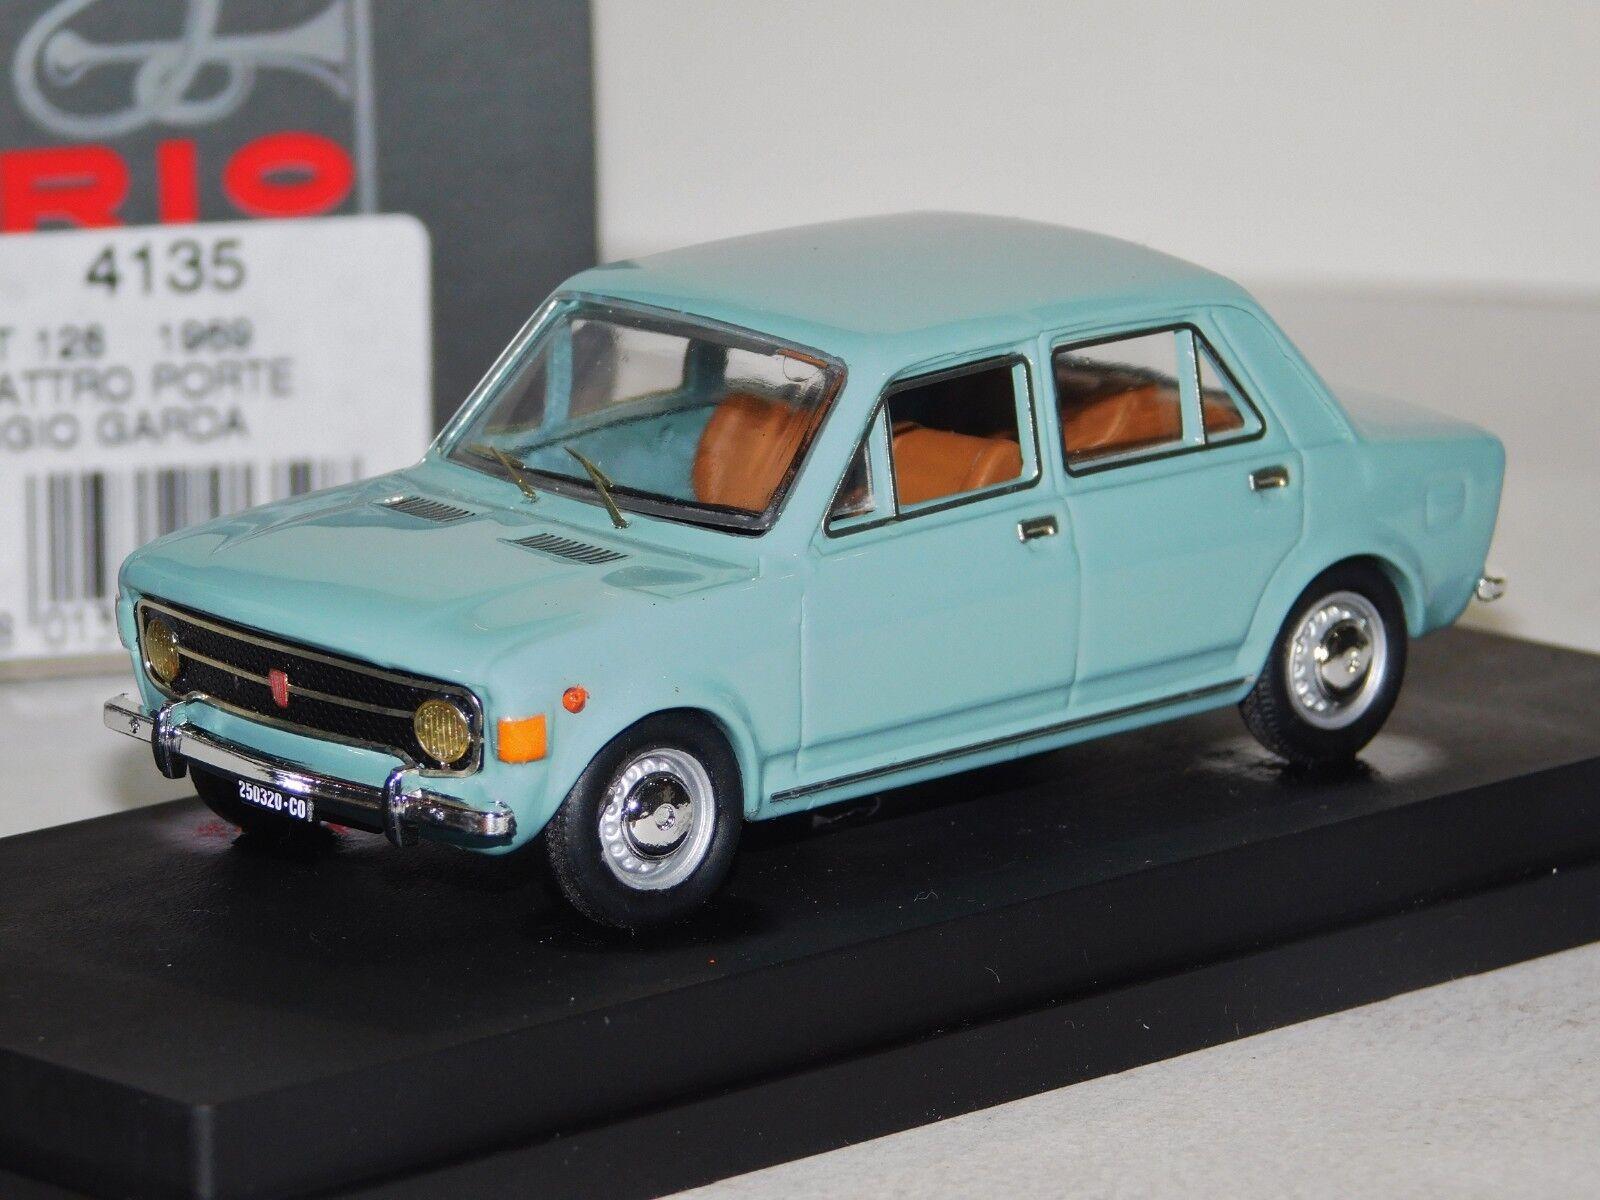 FIAT 128 grey GARDA QUATTRO PORTE 1969 RIO 4135 1 43